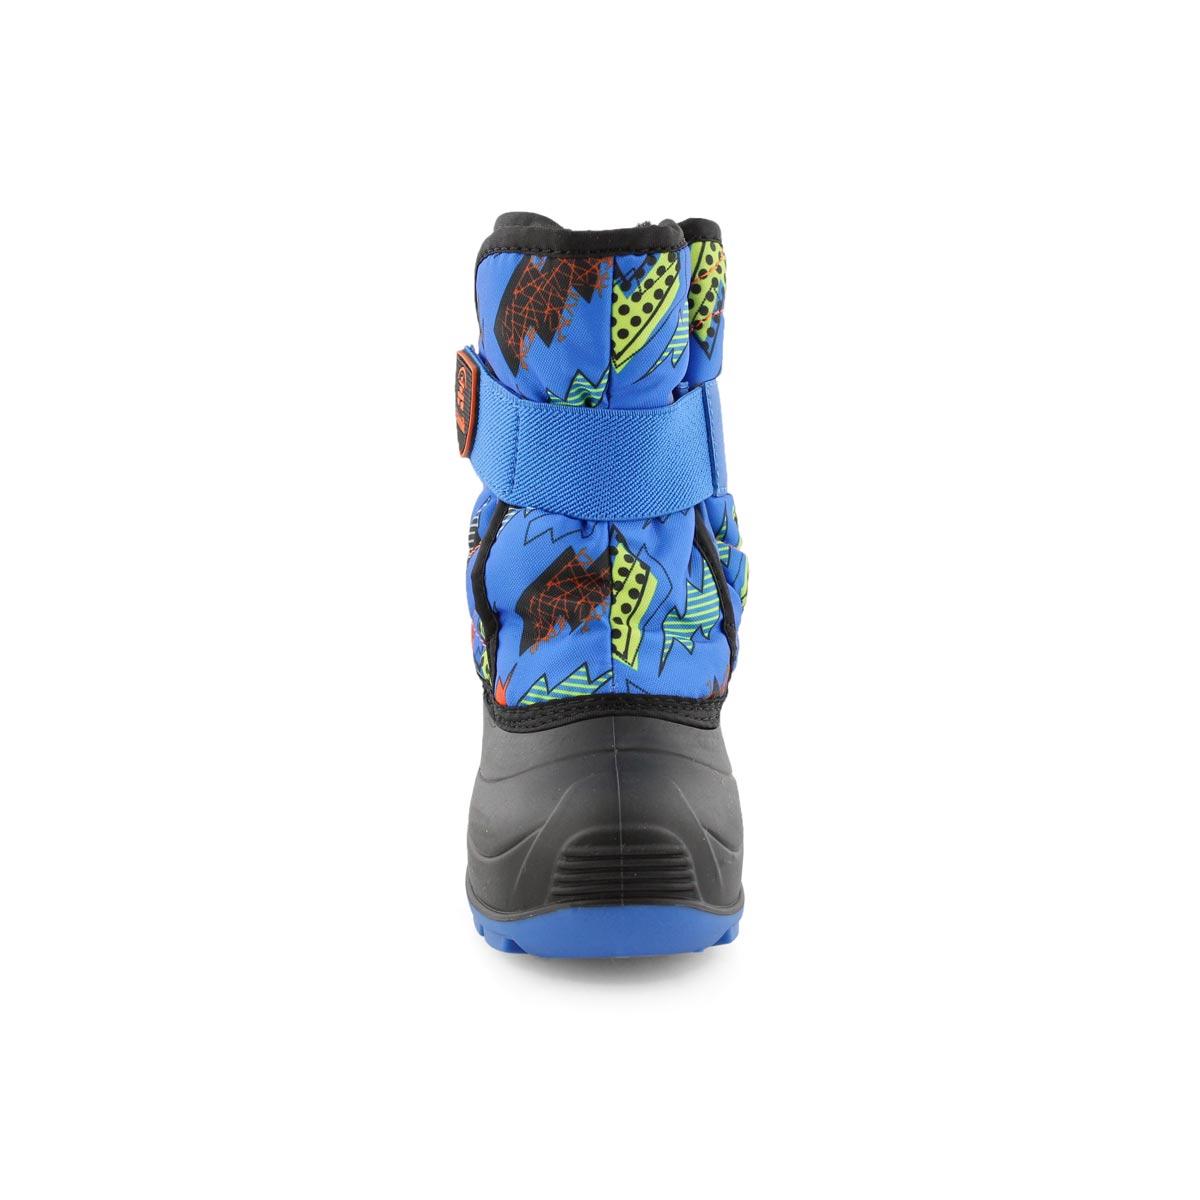 Infants' SNOWBUG4 blue/orange wtpf winter boots